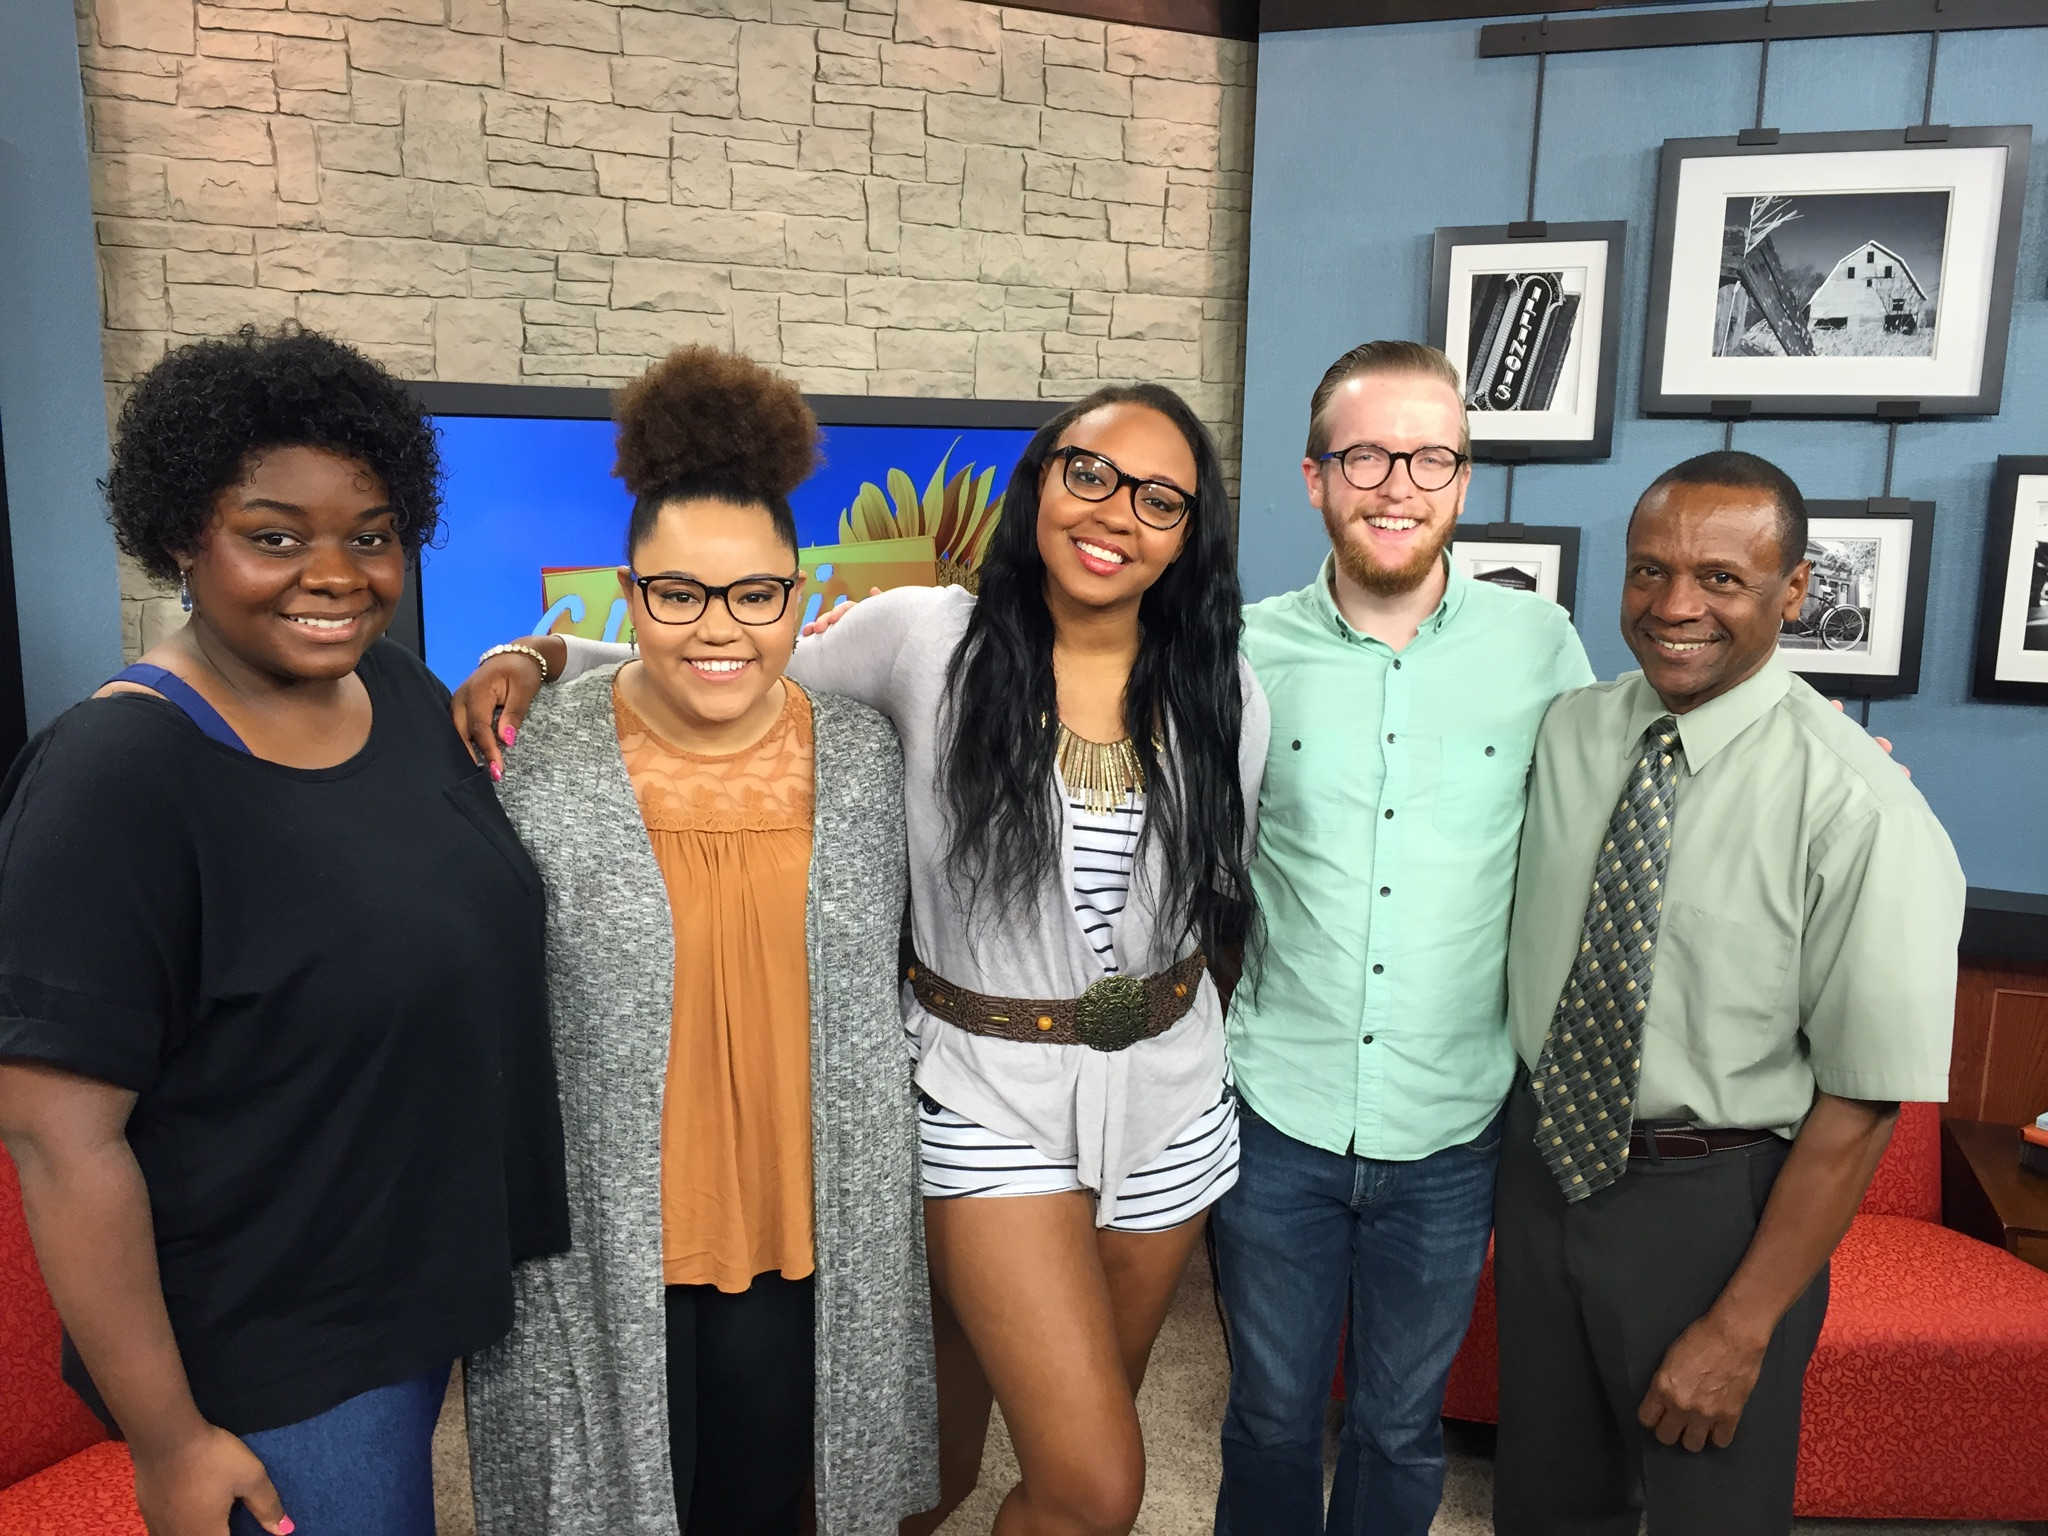 With J'Lyn Hope, Tafadzwa Diener, Jasmine Dandridge, and Nathaniel Banks on the set of ciLiving, 8/1/2016